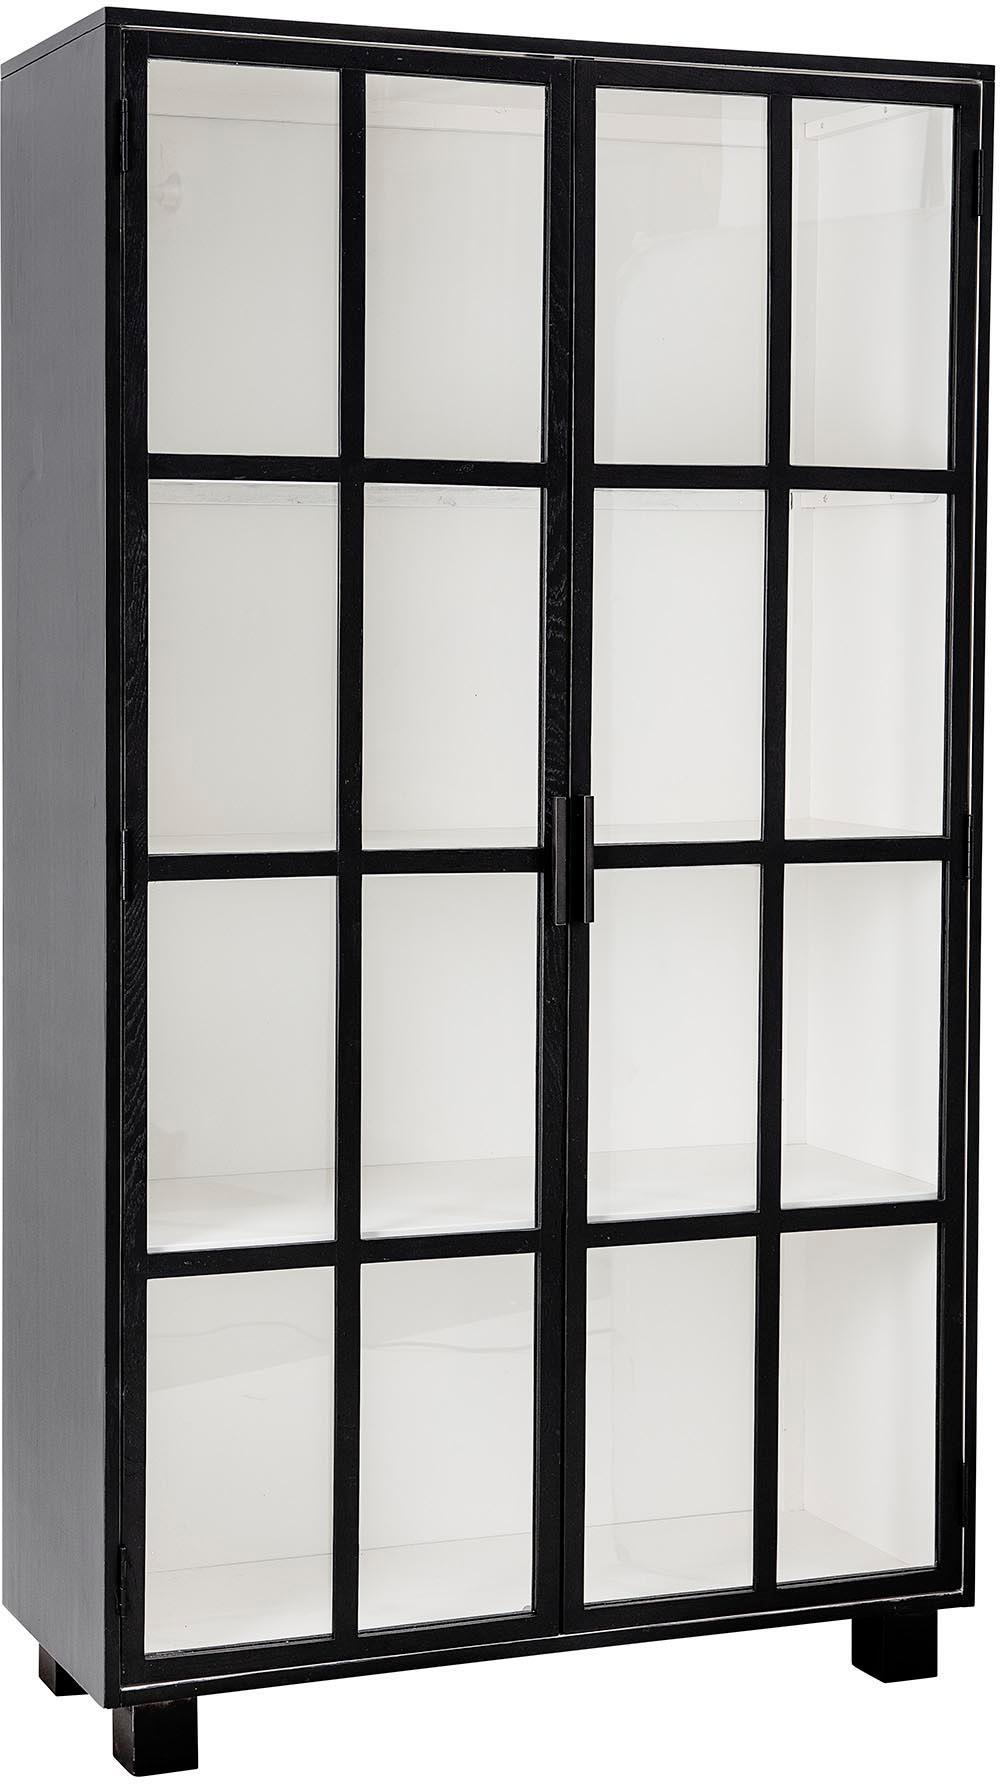 Vetrina nera-bianca Jesper, Nero, bianco, Larg. 114 x Alt. 200 cm